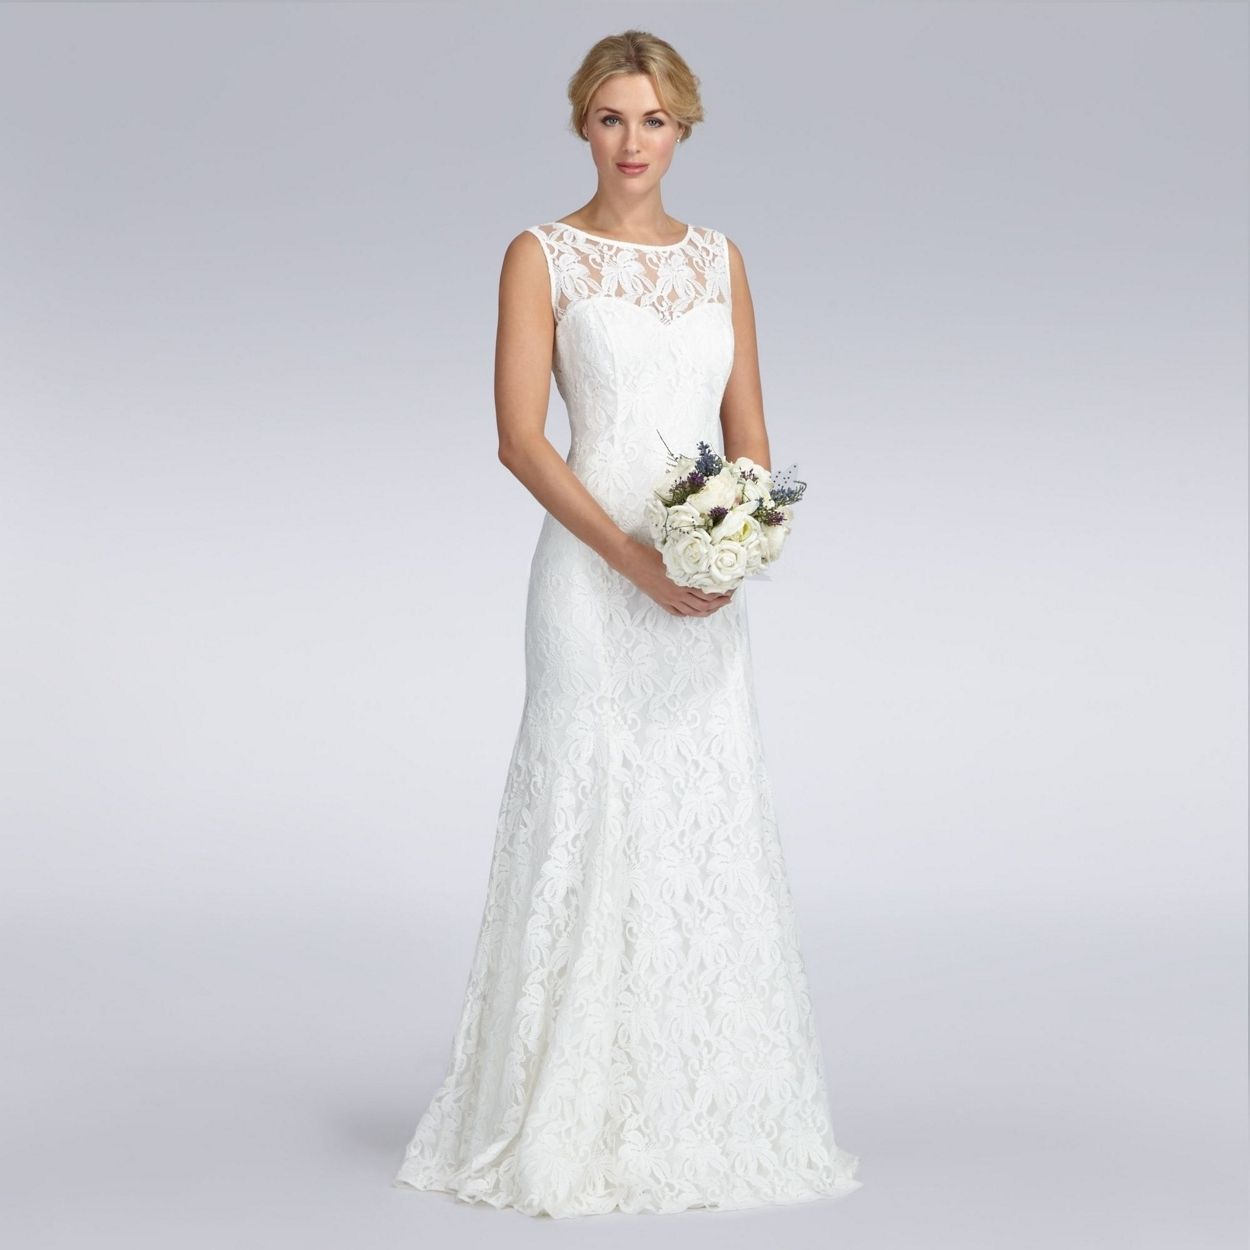 Debenhams Wedding Dresses Manchester 2nd Wedding Dresses Wedding Dresses For Older Women Older Bride [ 1250 x 1250 Pixel ]